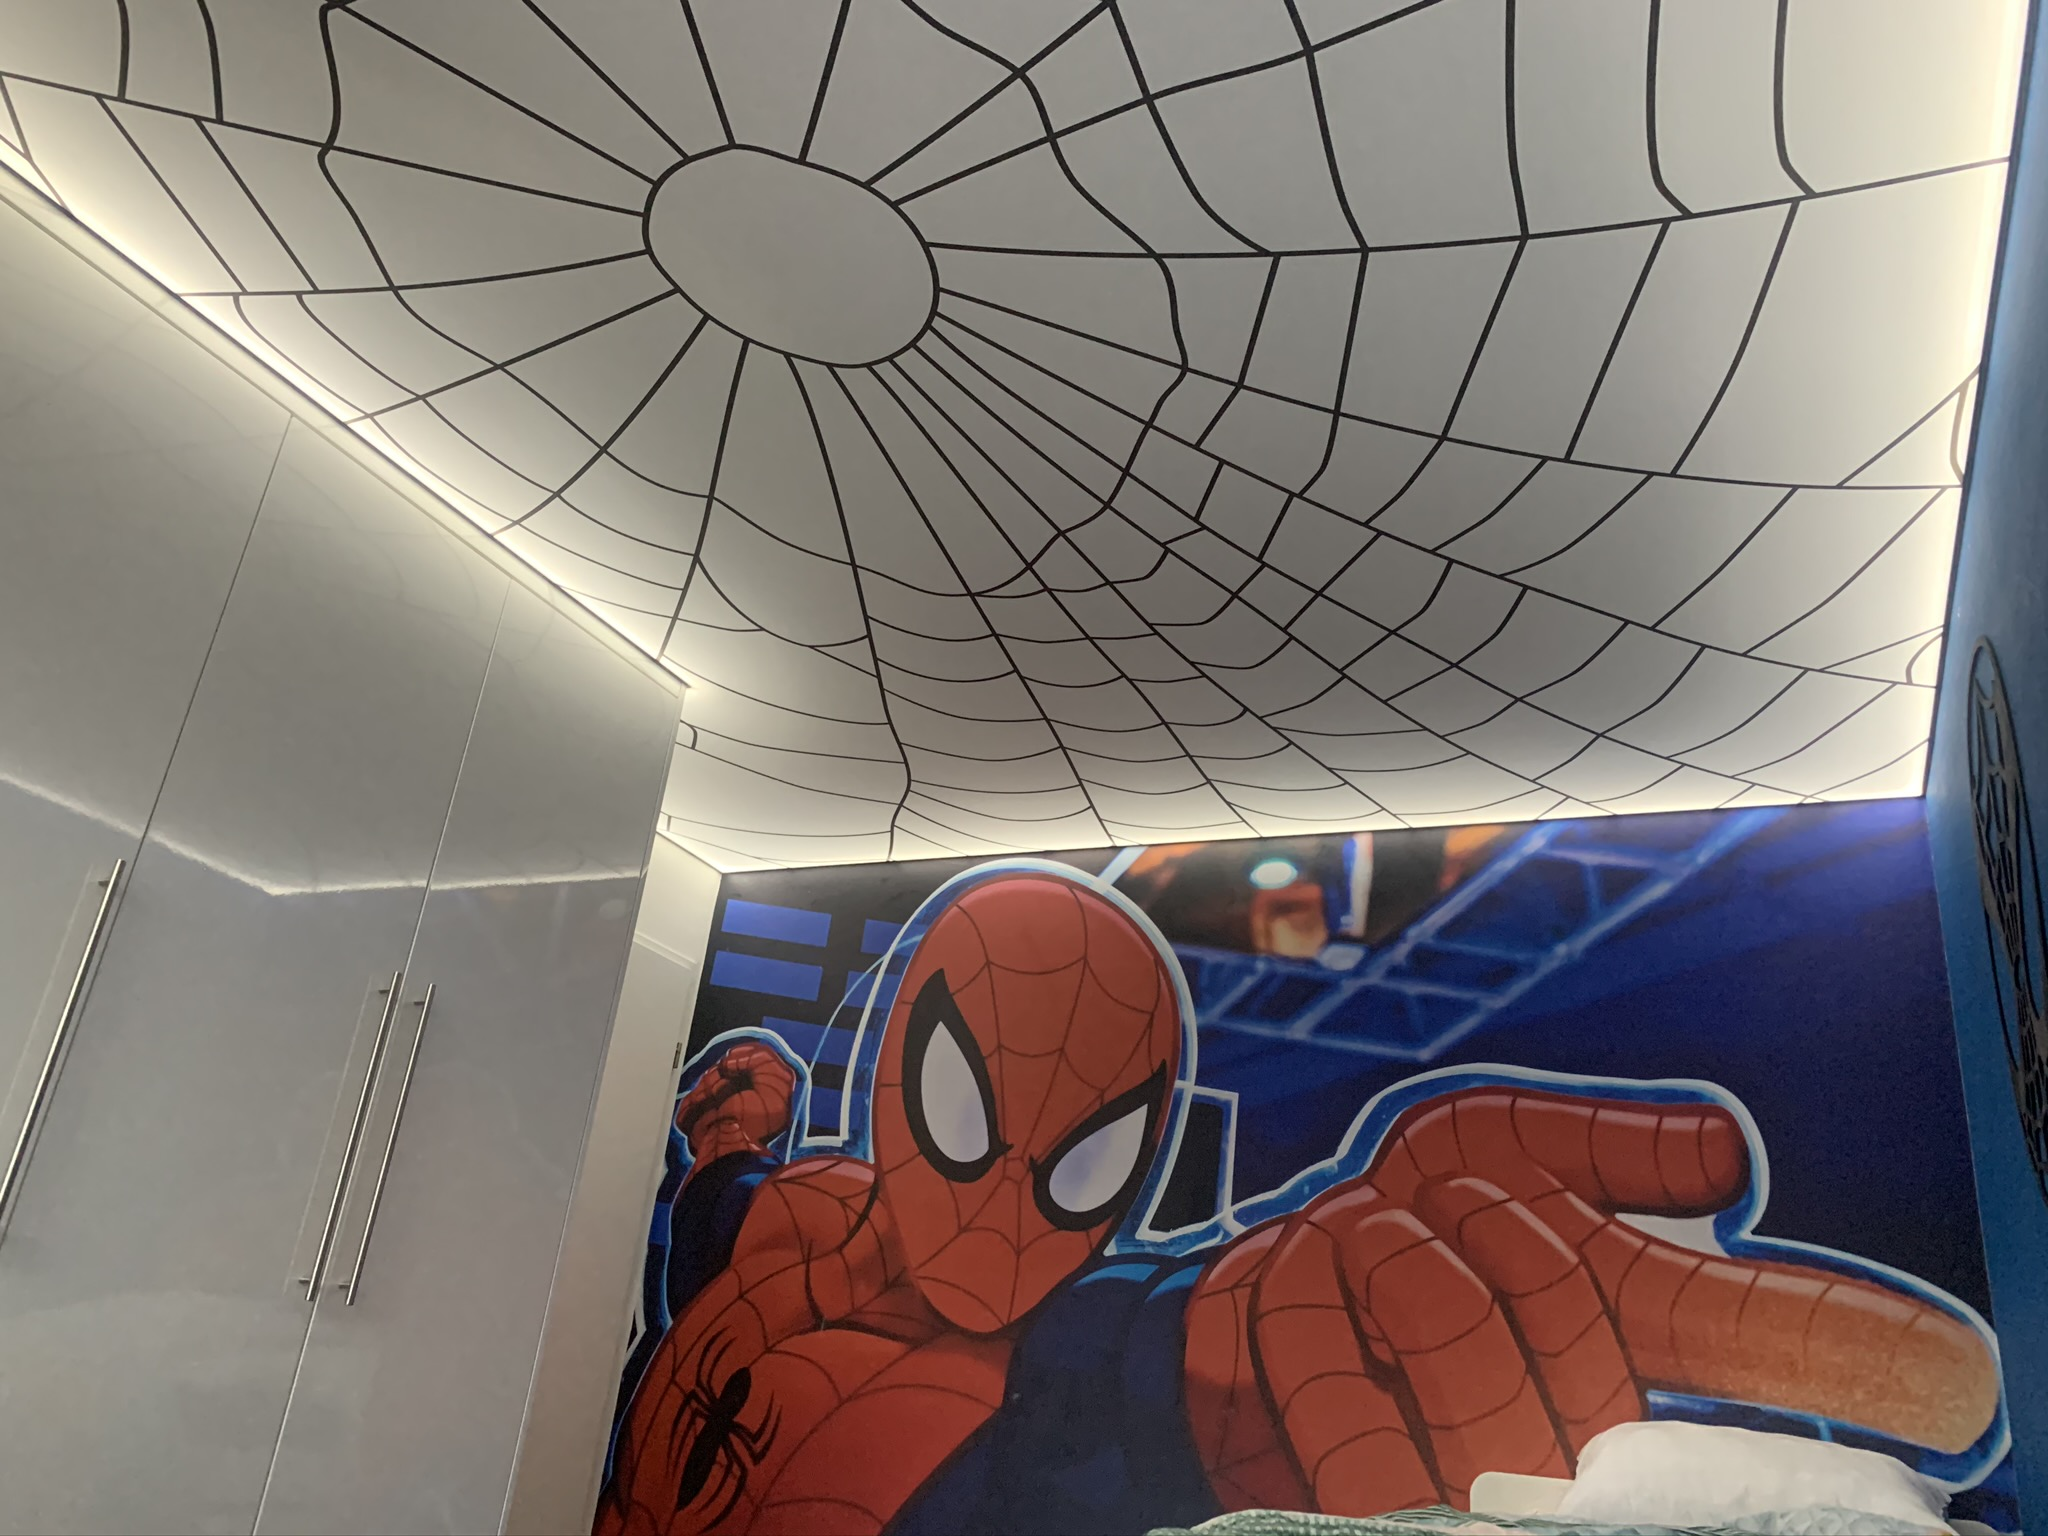 spanplafond met spiderman print